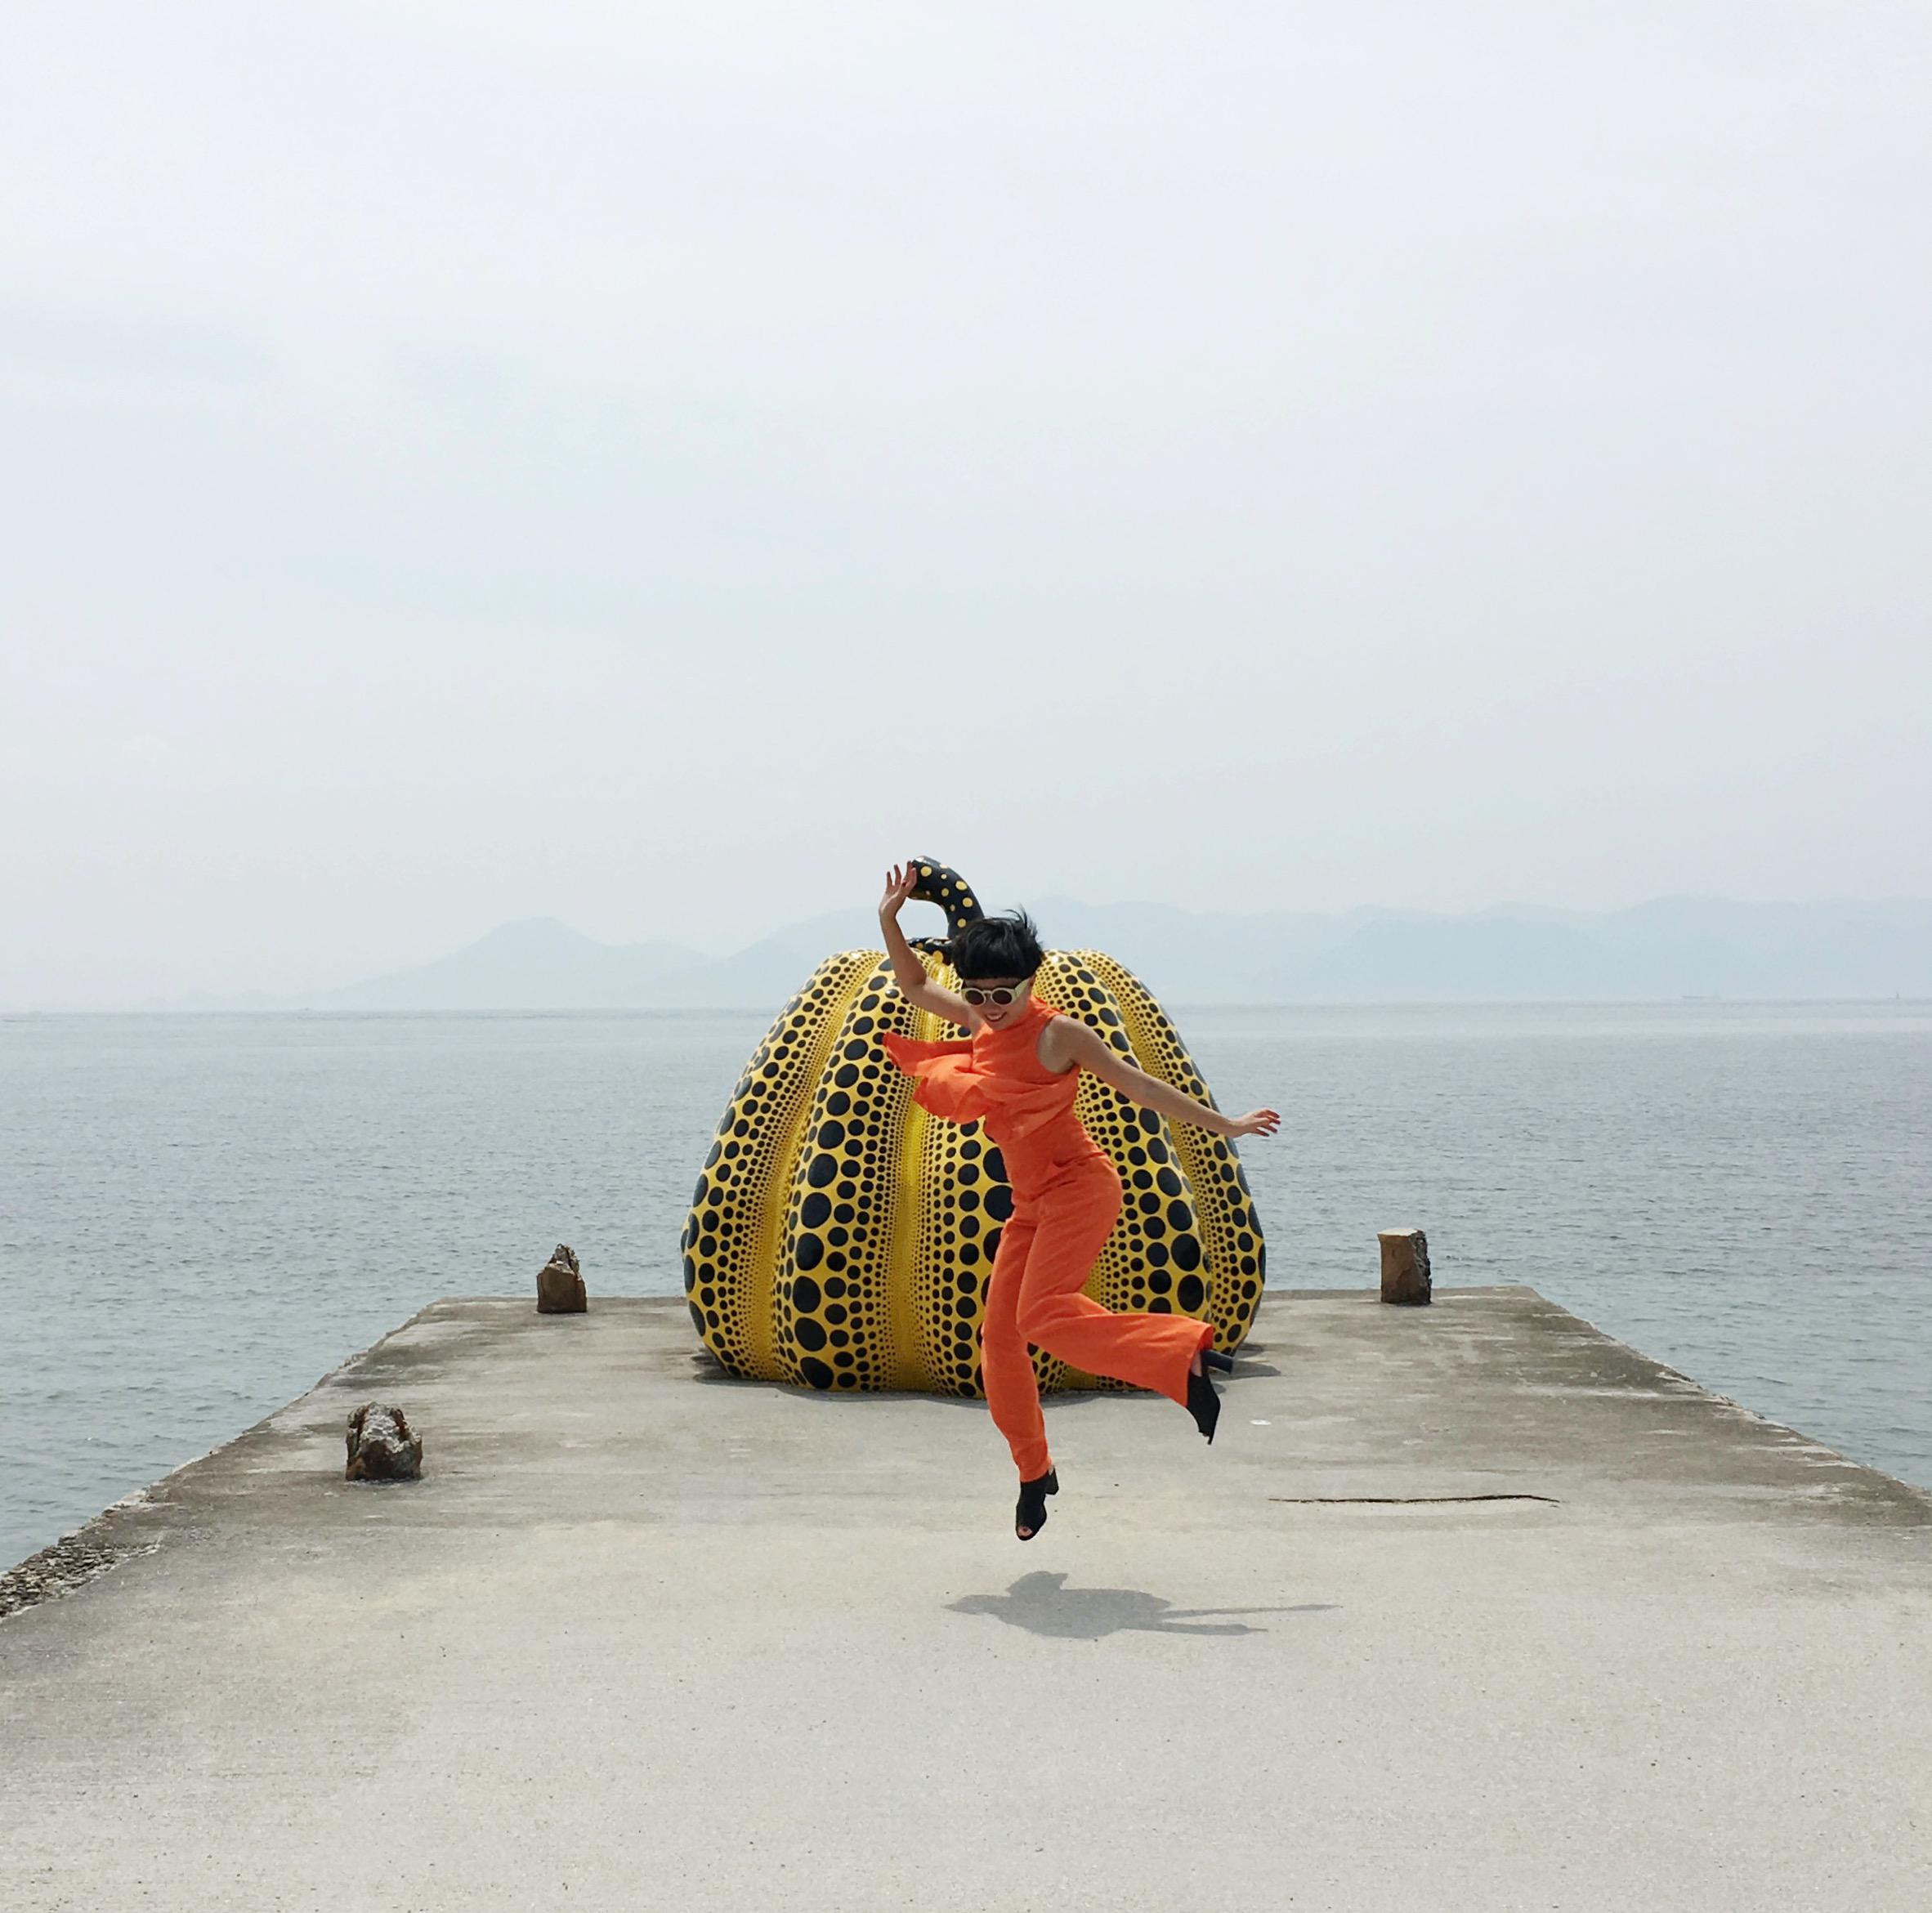 Fei with Yayoi Kusama's Pumpkin on Naoshima Island, Japan, 2017